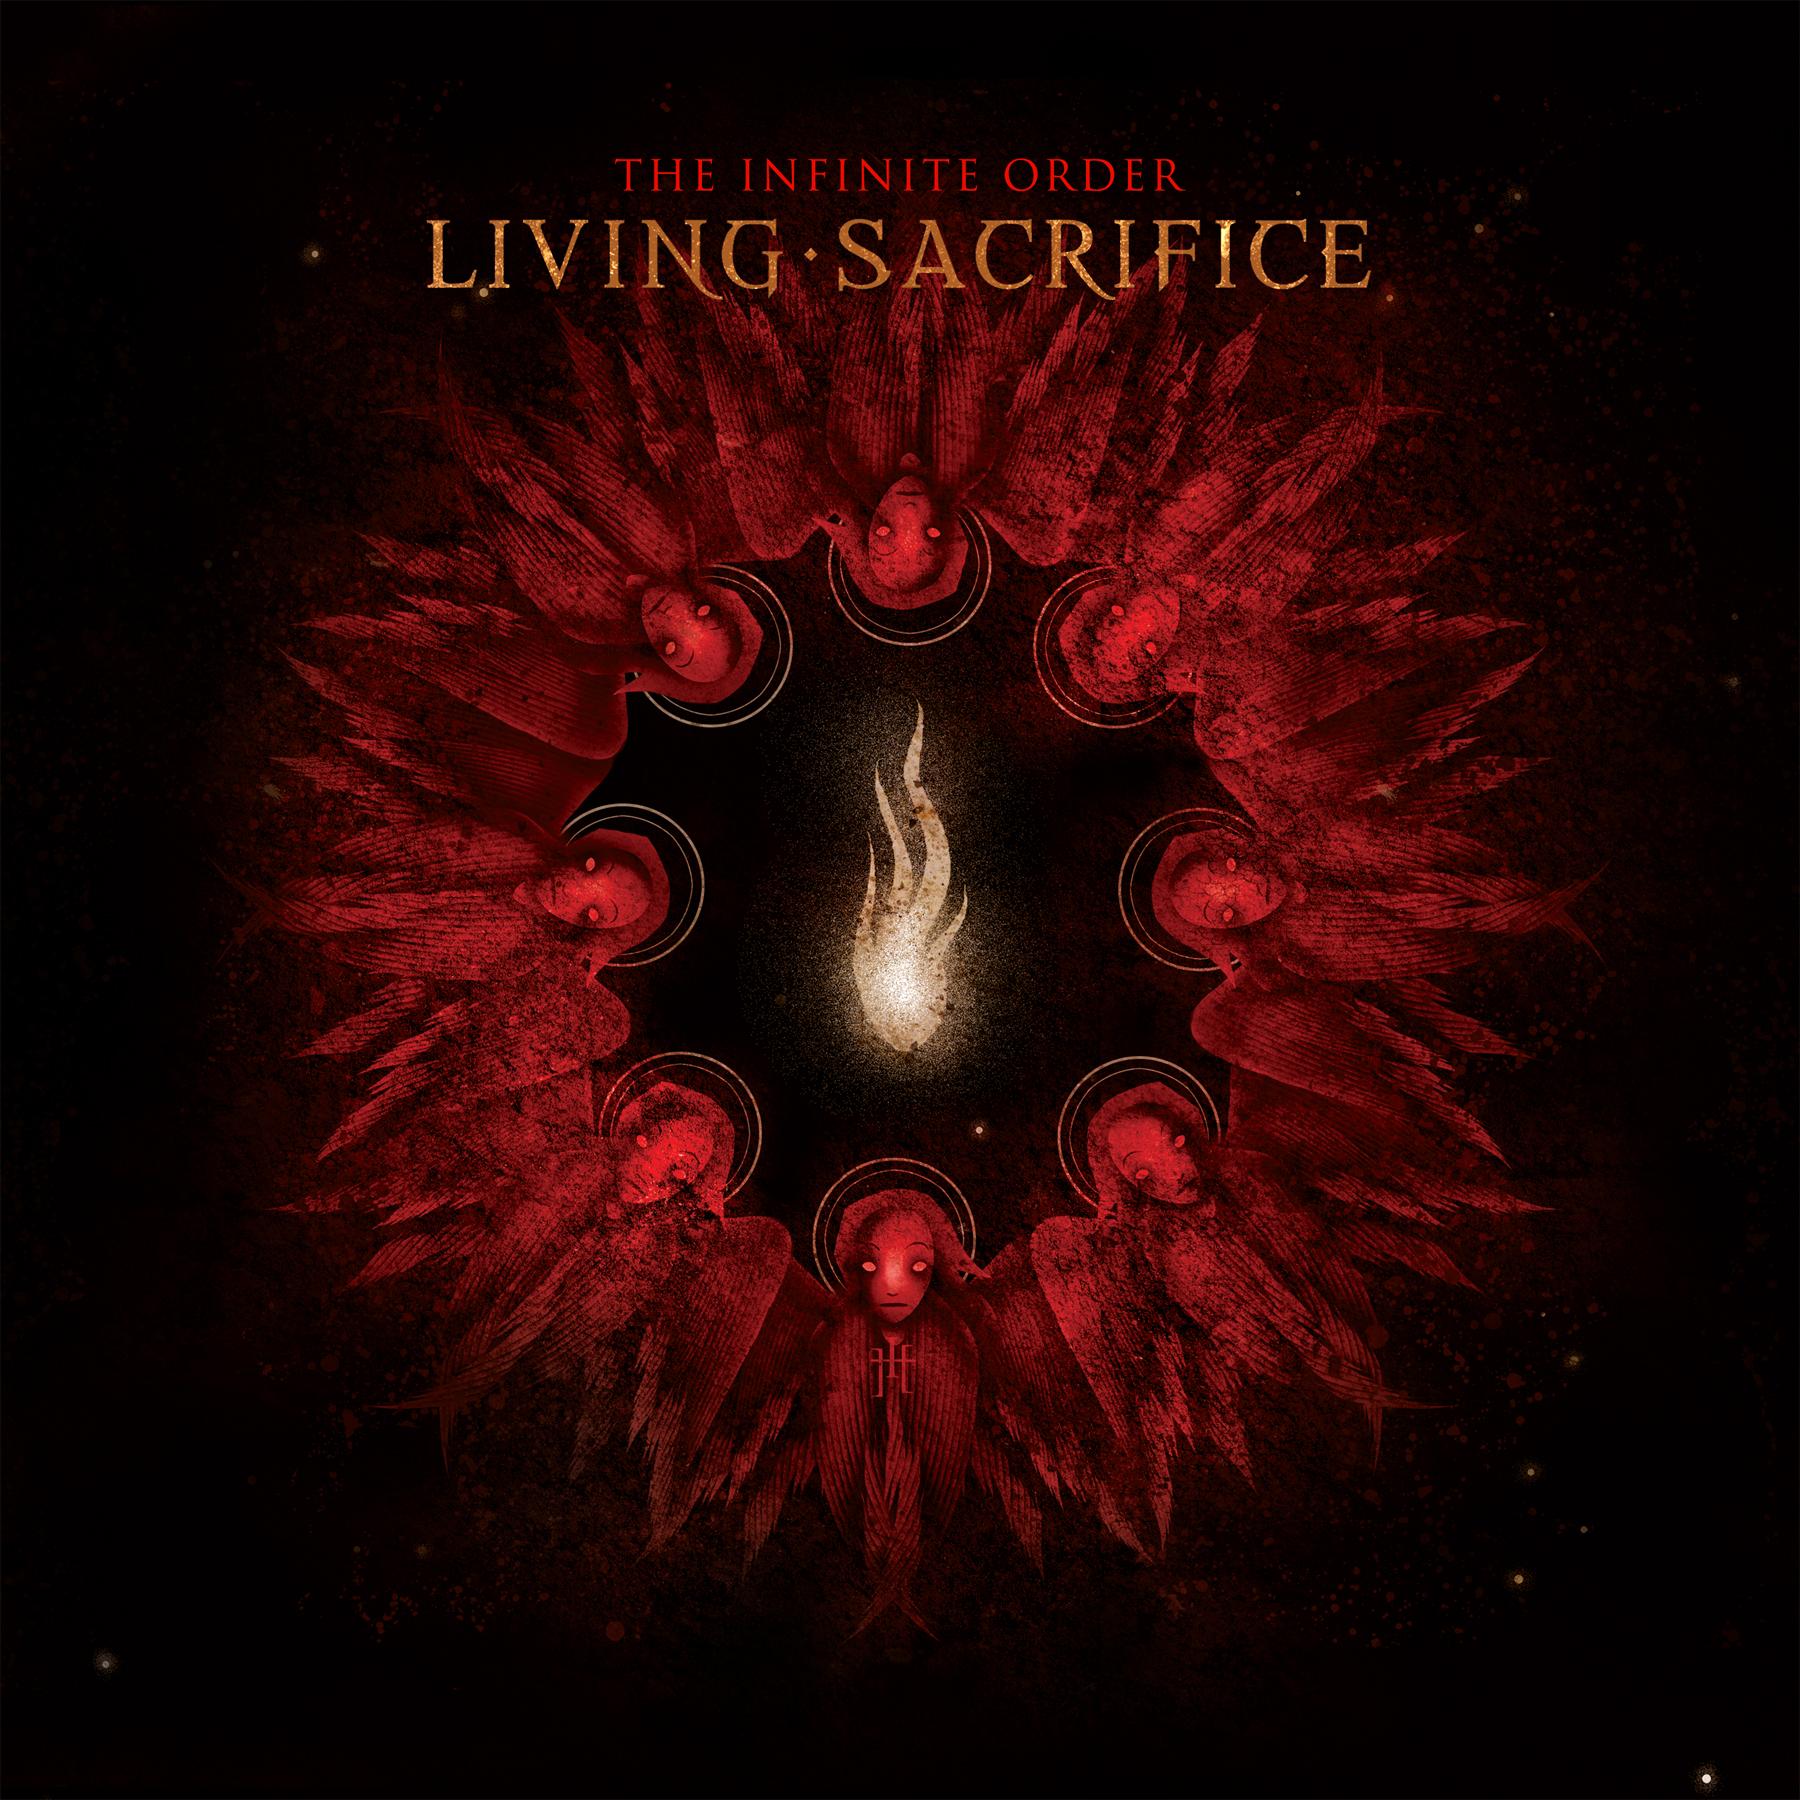 Living sacrifice the infinite order shadylittleroad com